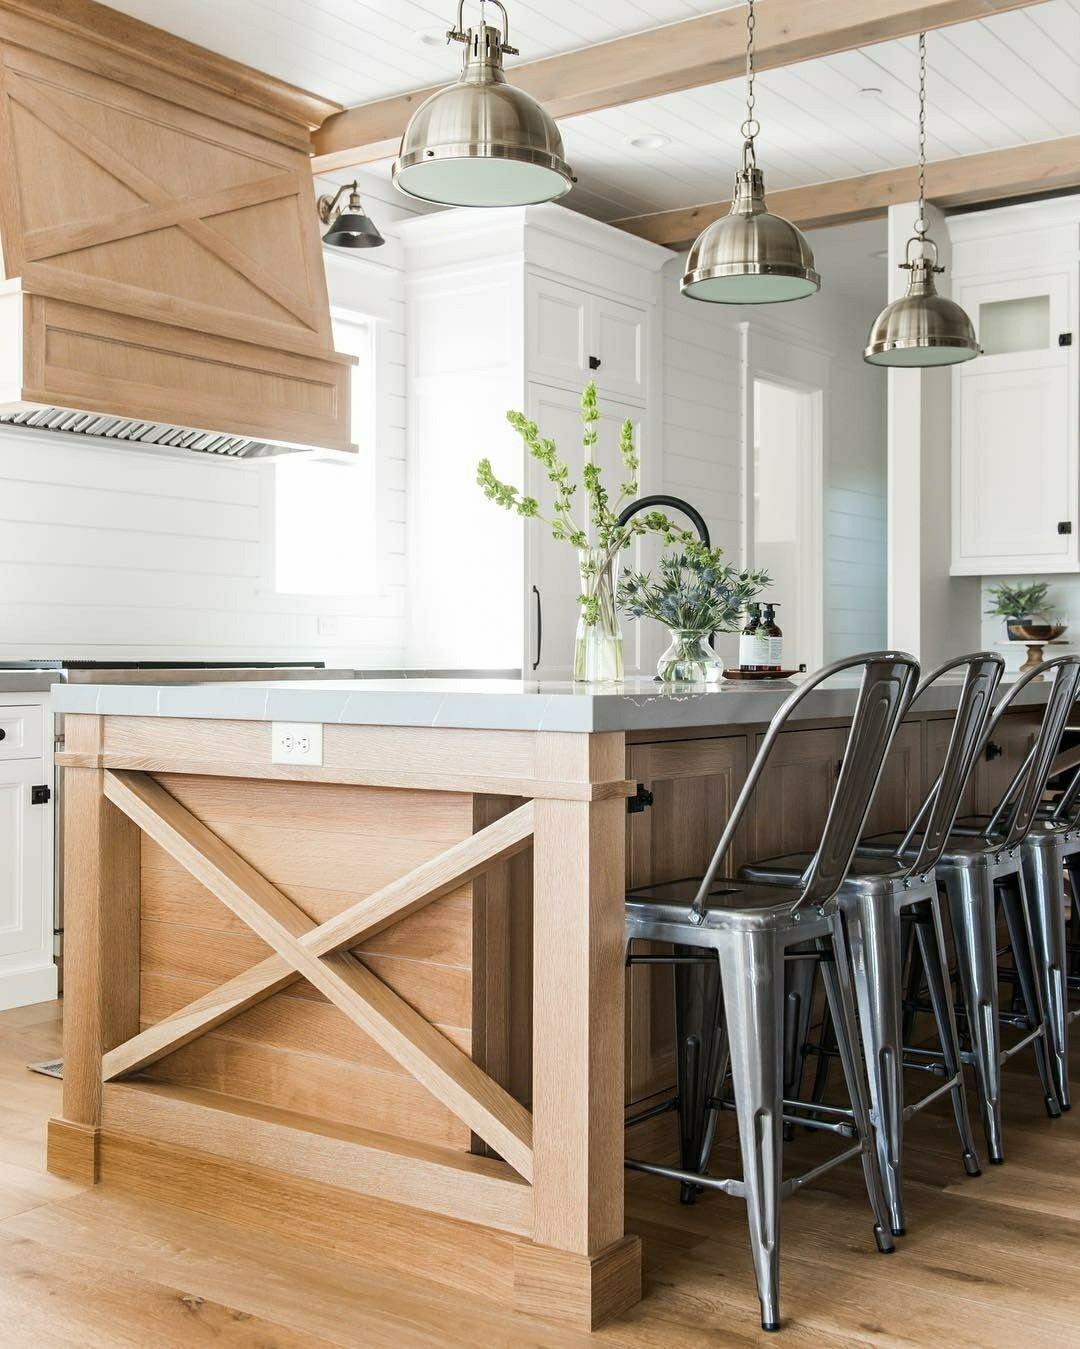 Pin de Jay Johnson en Home | Pinterest | Paseos y Cocinas